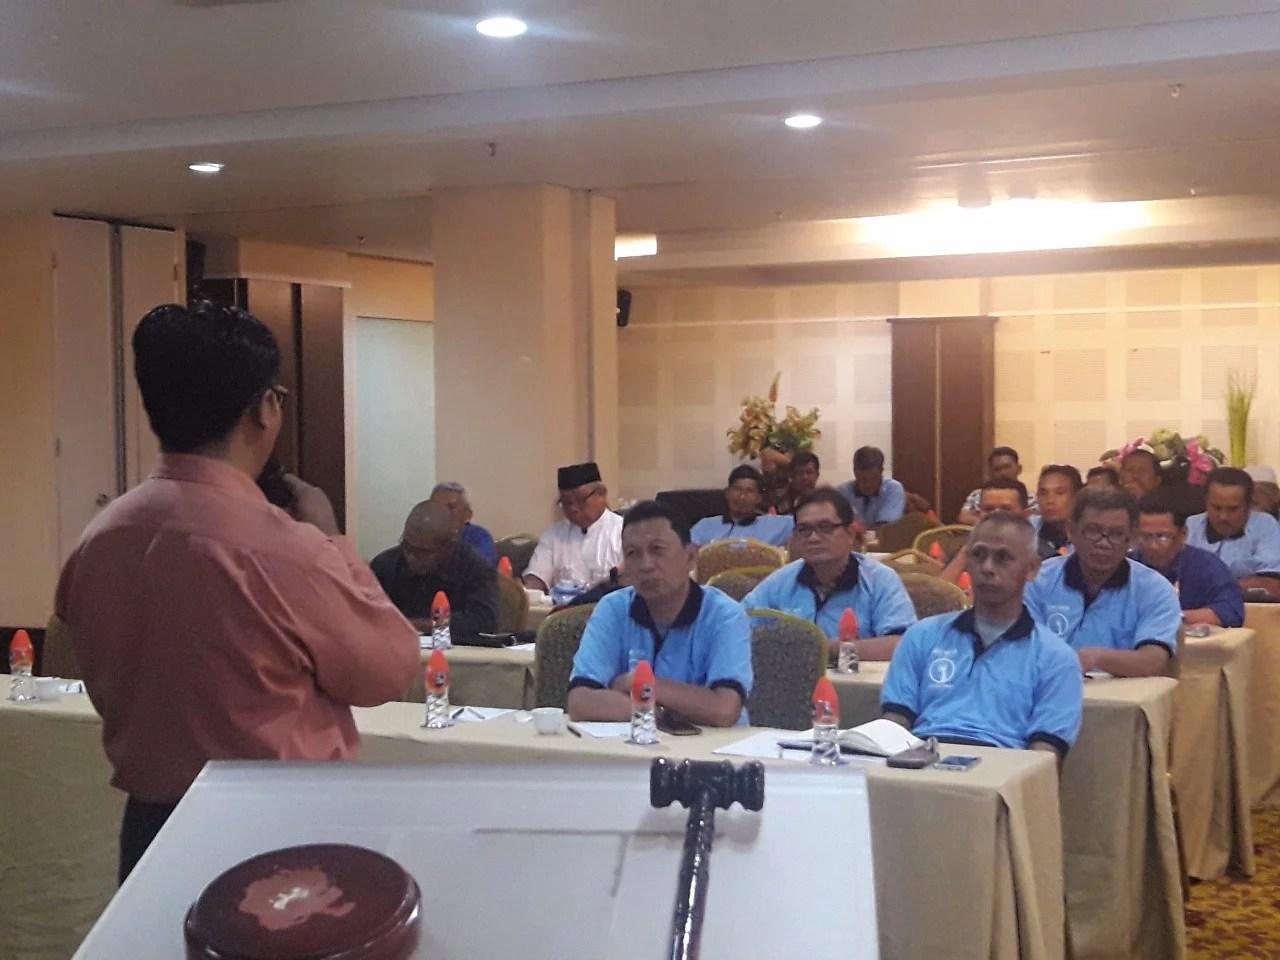 Dinas Bangunan dan Penataan Ruang Kota Tangsel Selenggarakan Peningkatan Kapasitas KSM Air Bersih Untuk SPAM Non Perpipaan